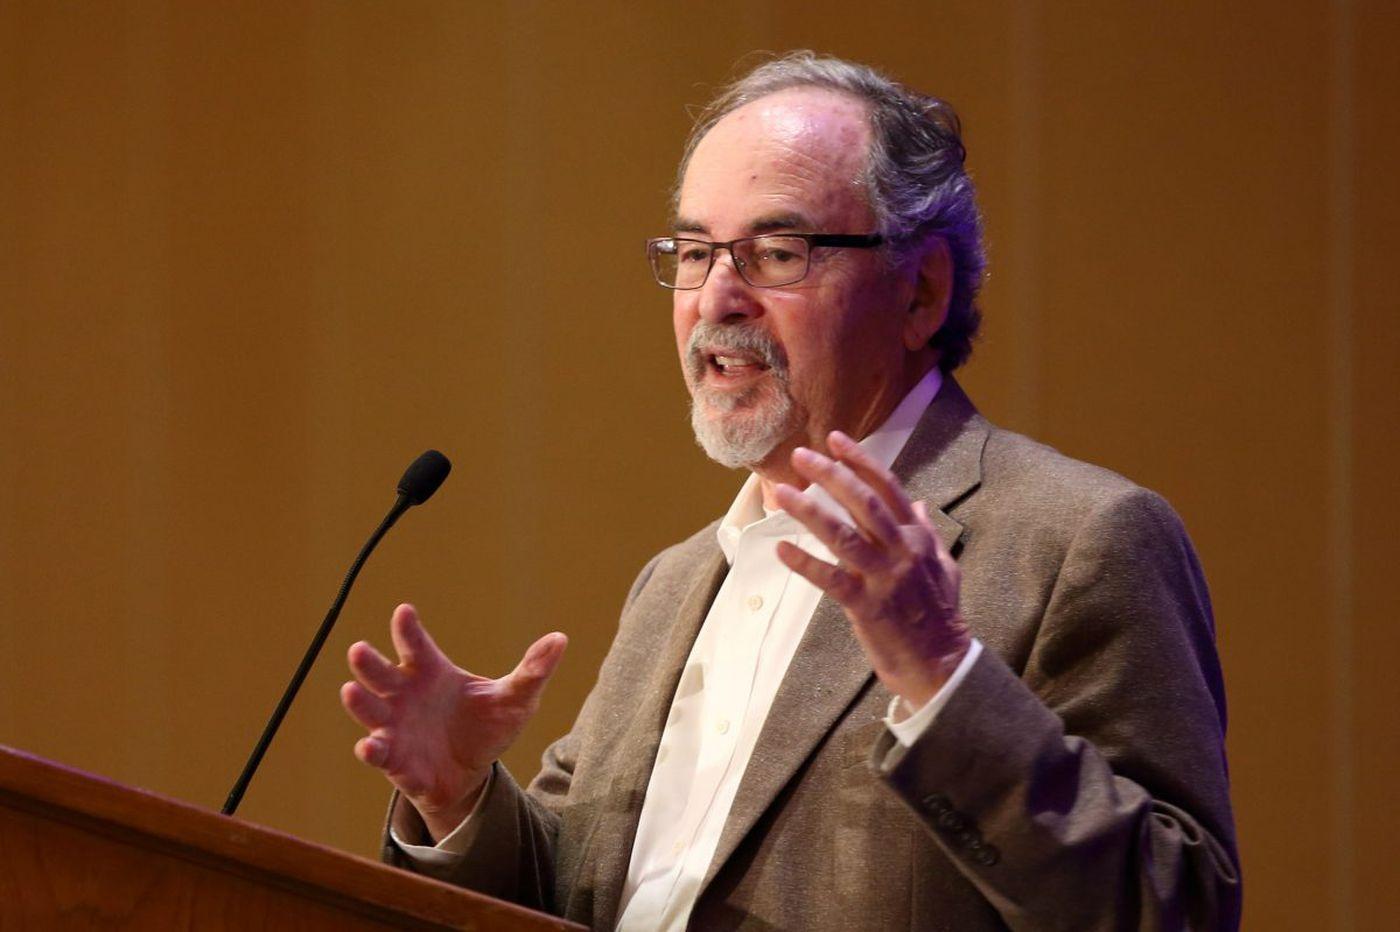 Horowitz's code of ethics would muzzle teachers